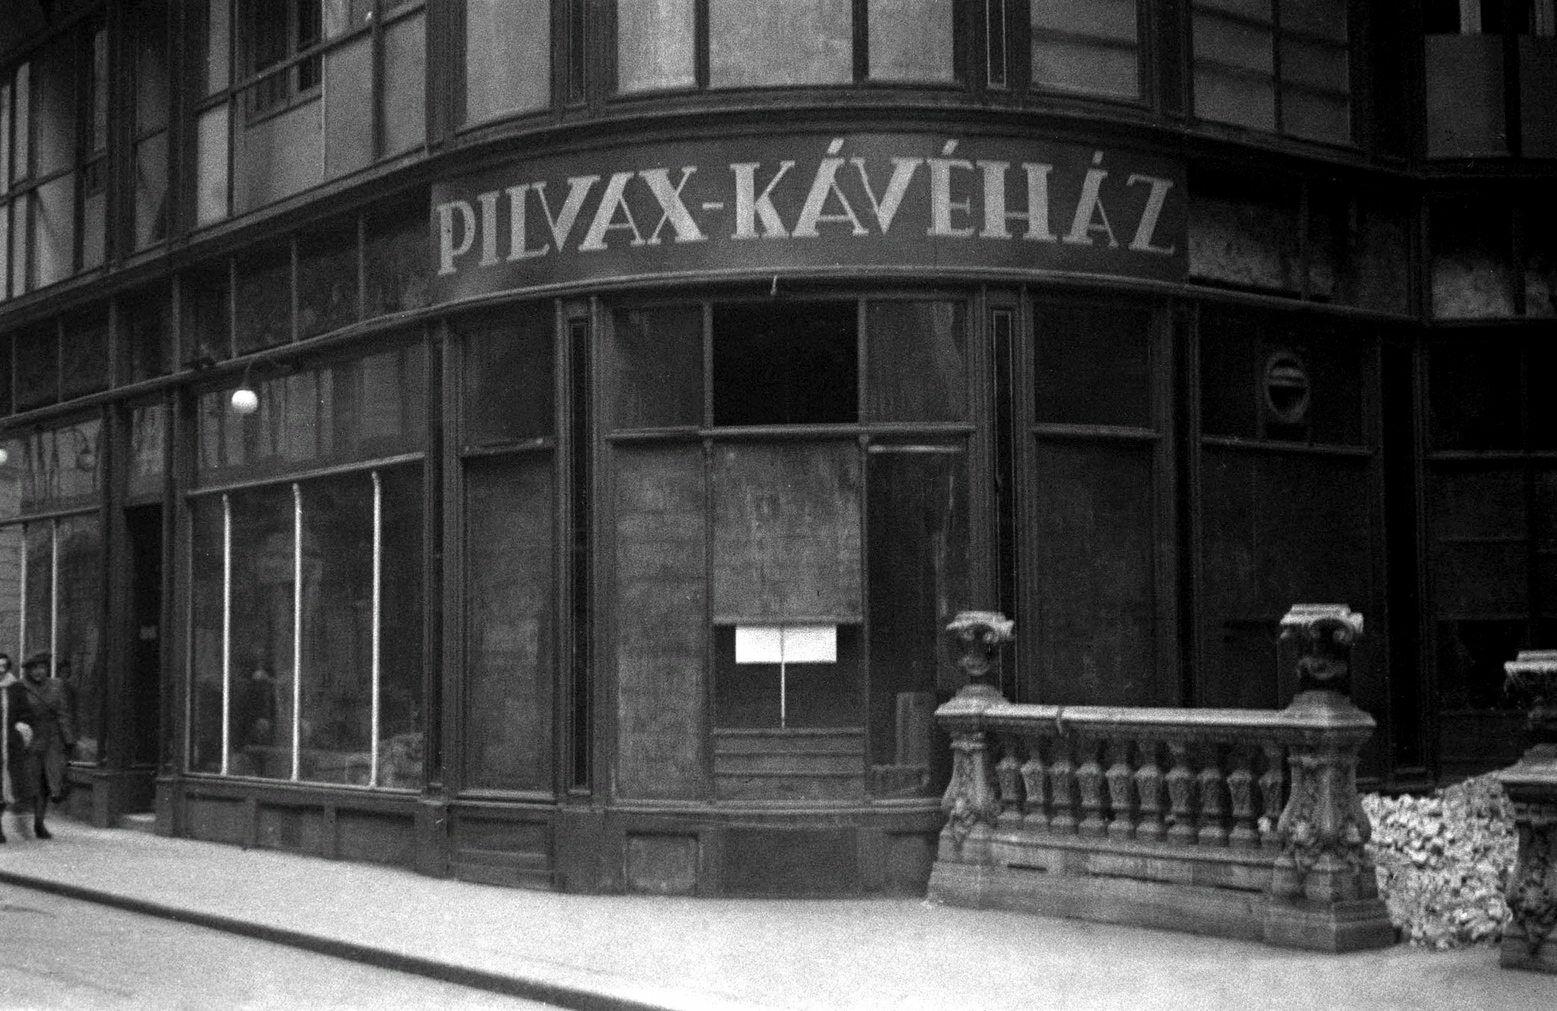 Pilvax kávéház